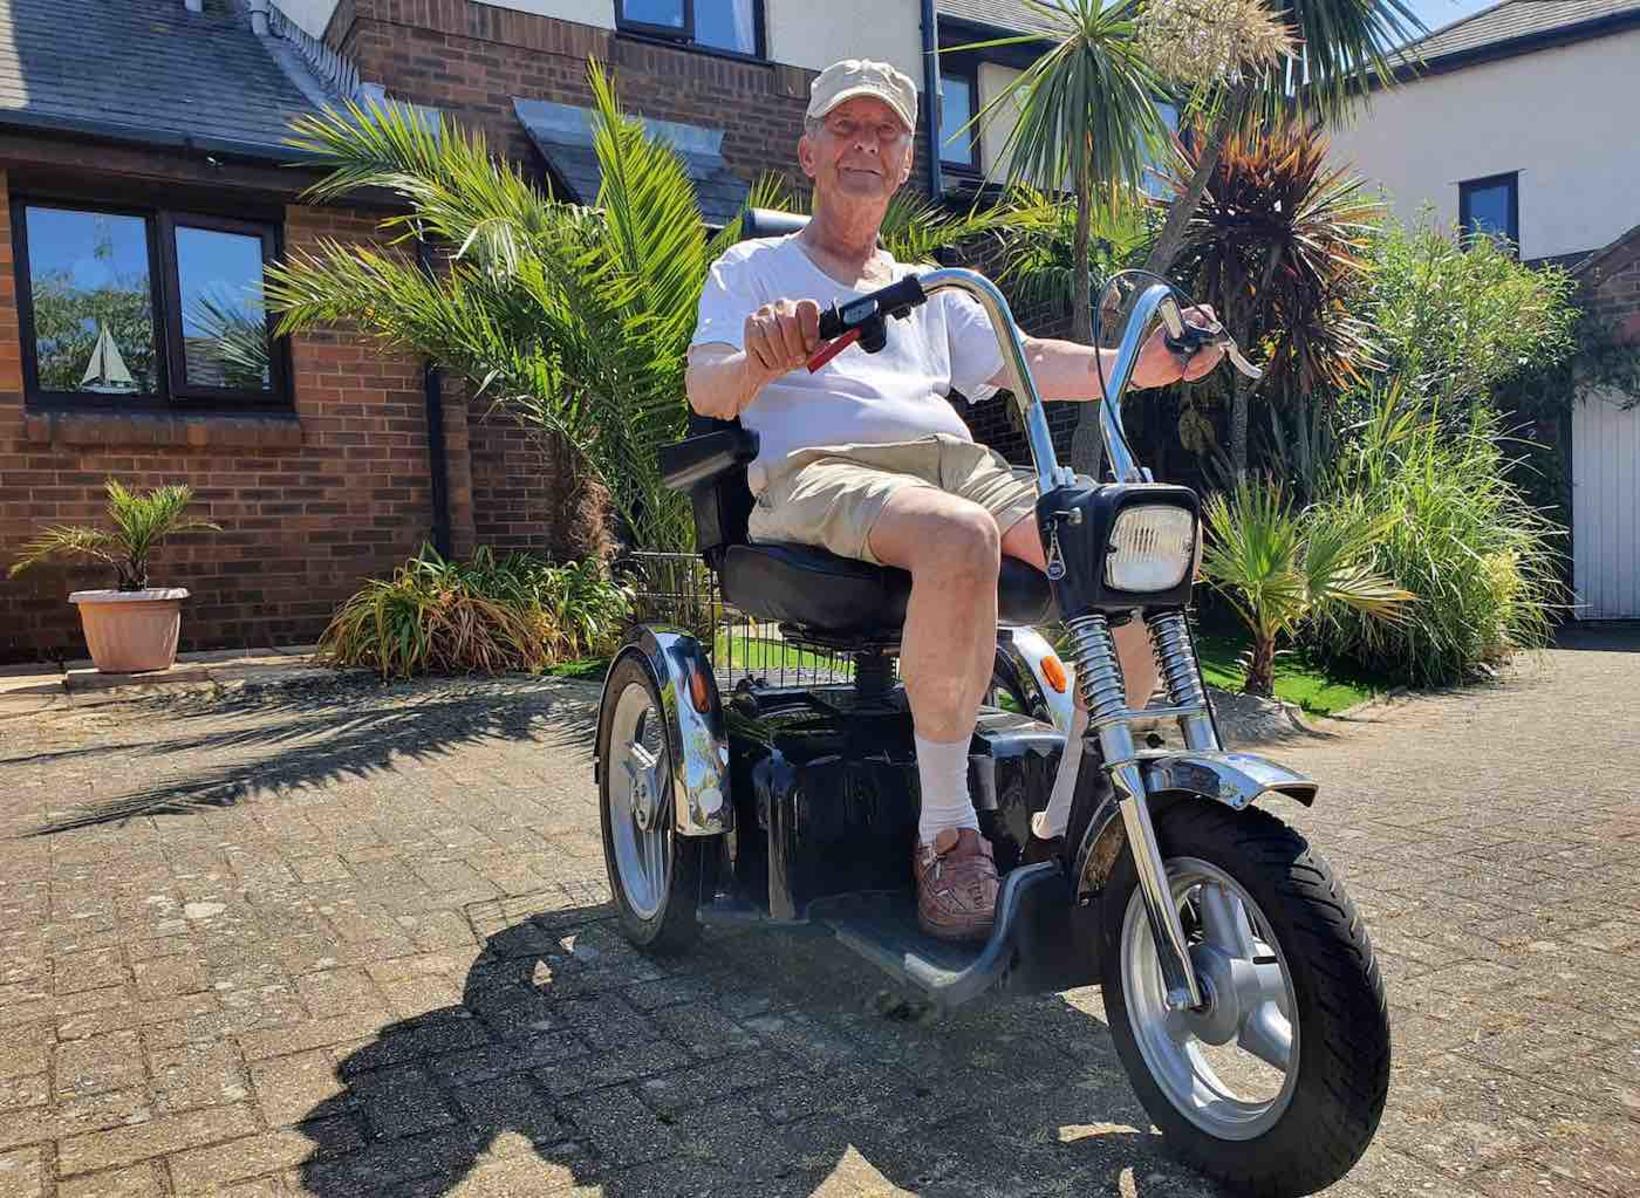 Thomas Kemp tekur sig vel út á Harley Davidson-rafskutlunni sinni.